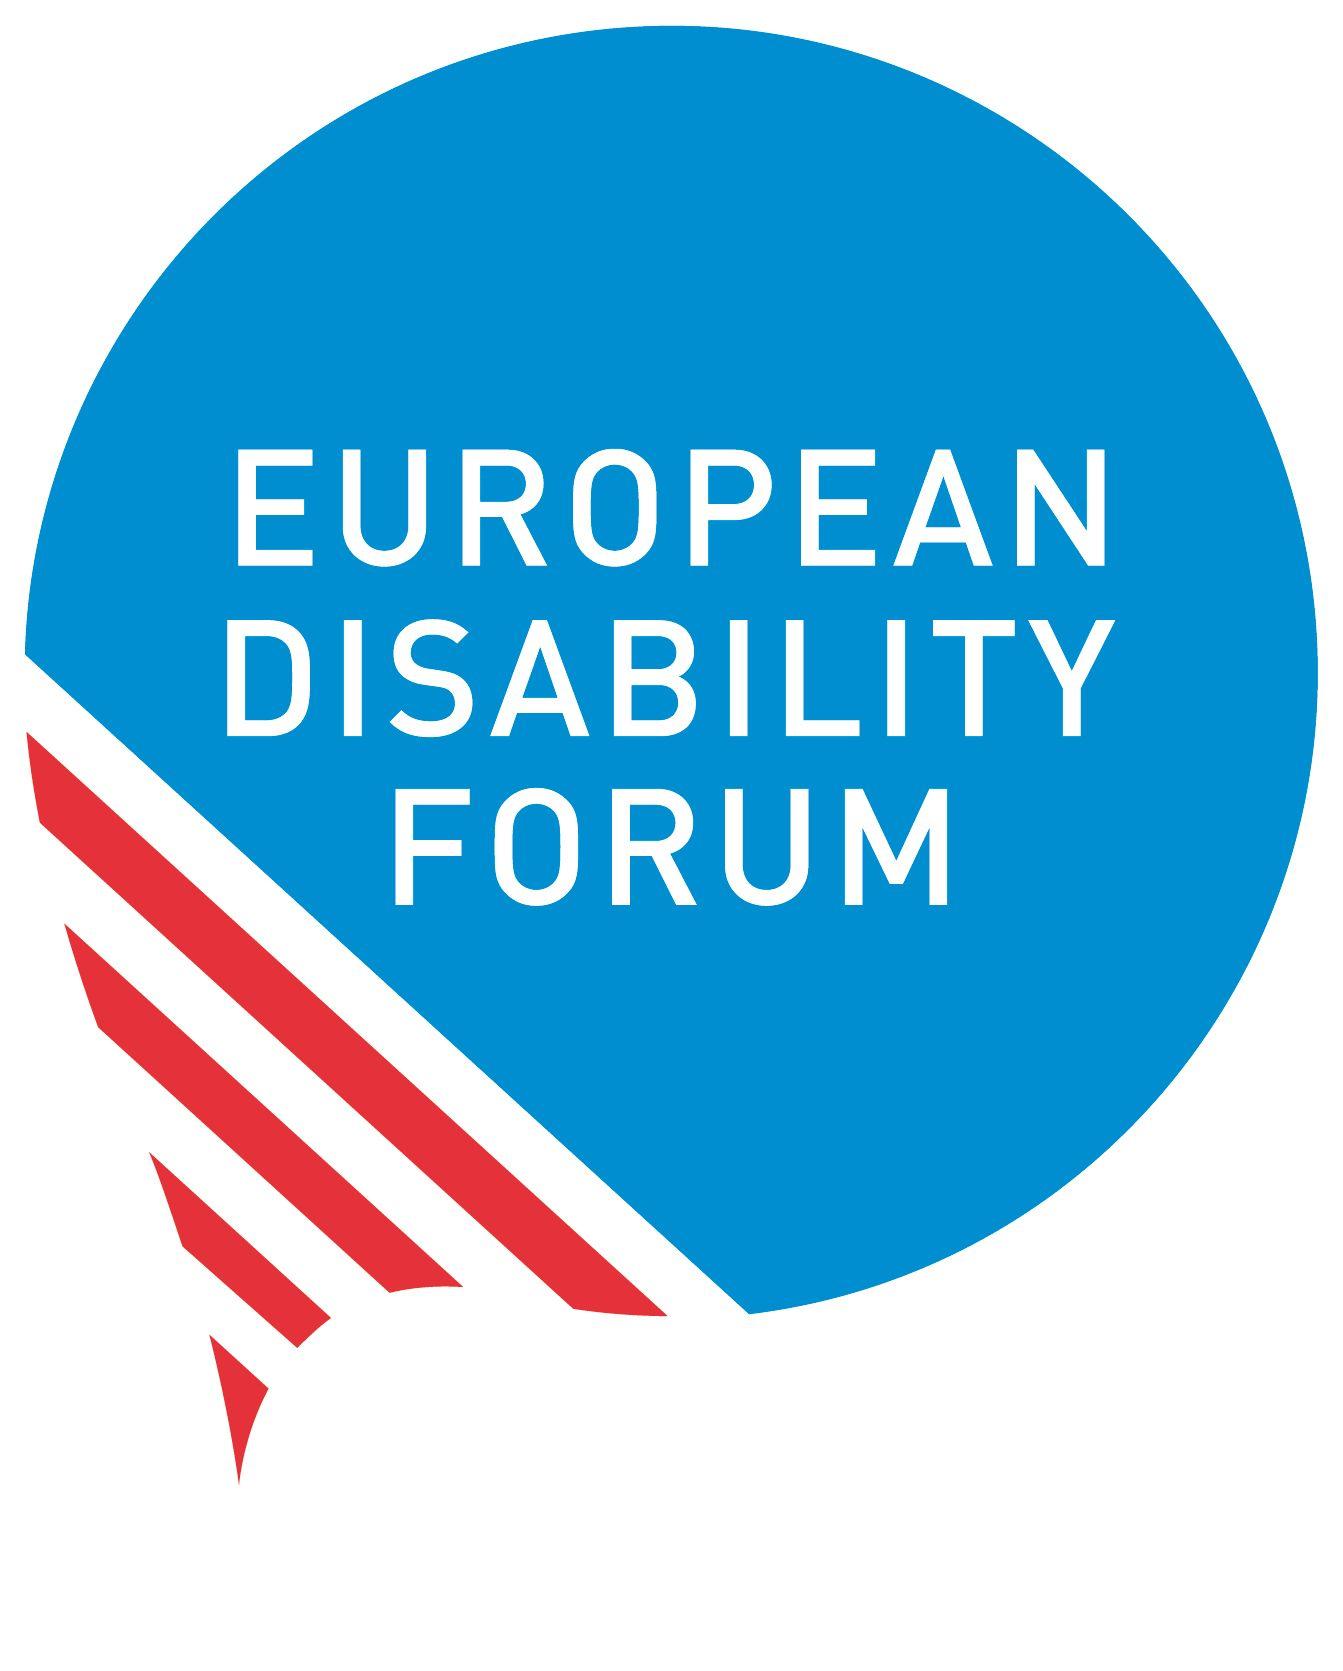 logo for European Disability Forum